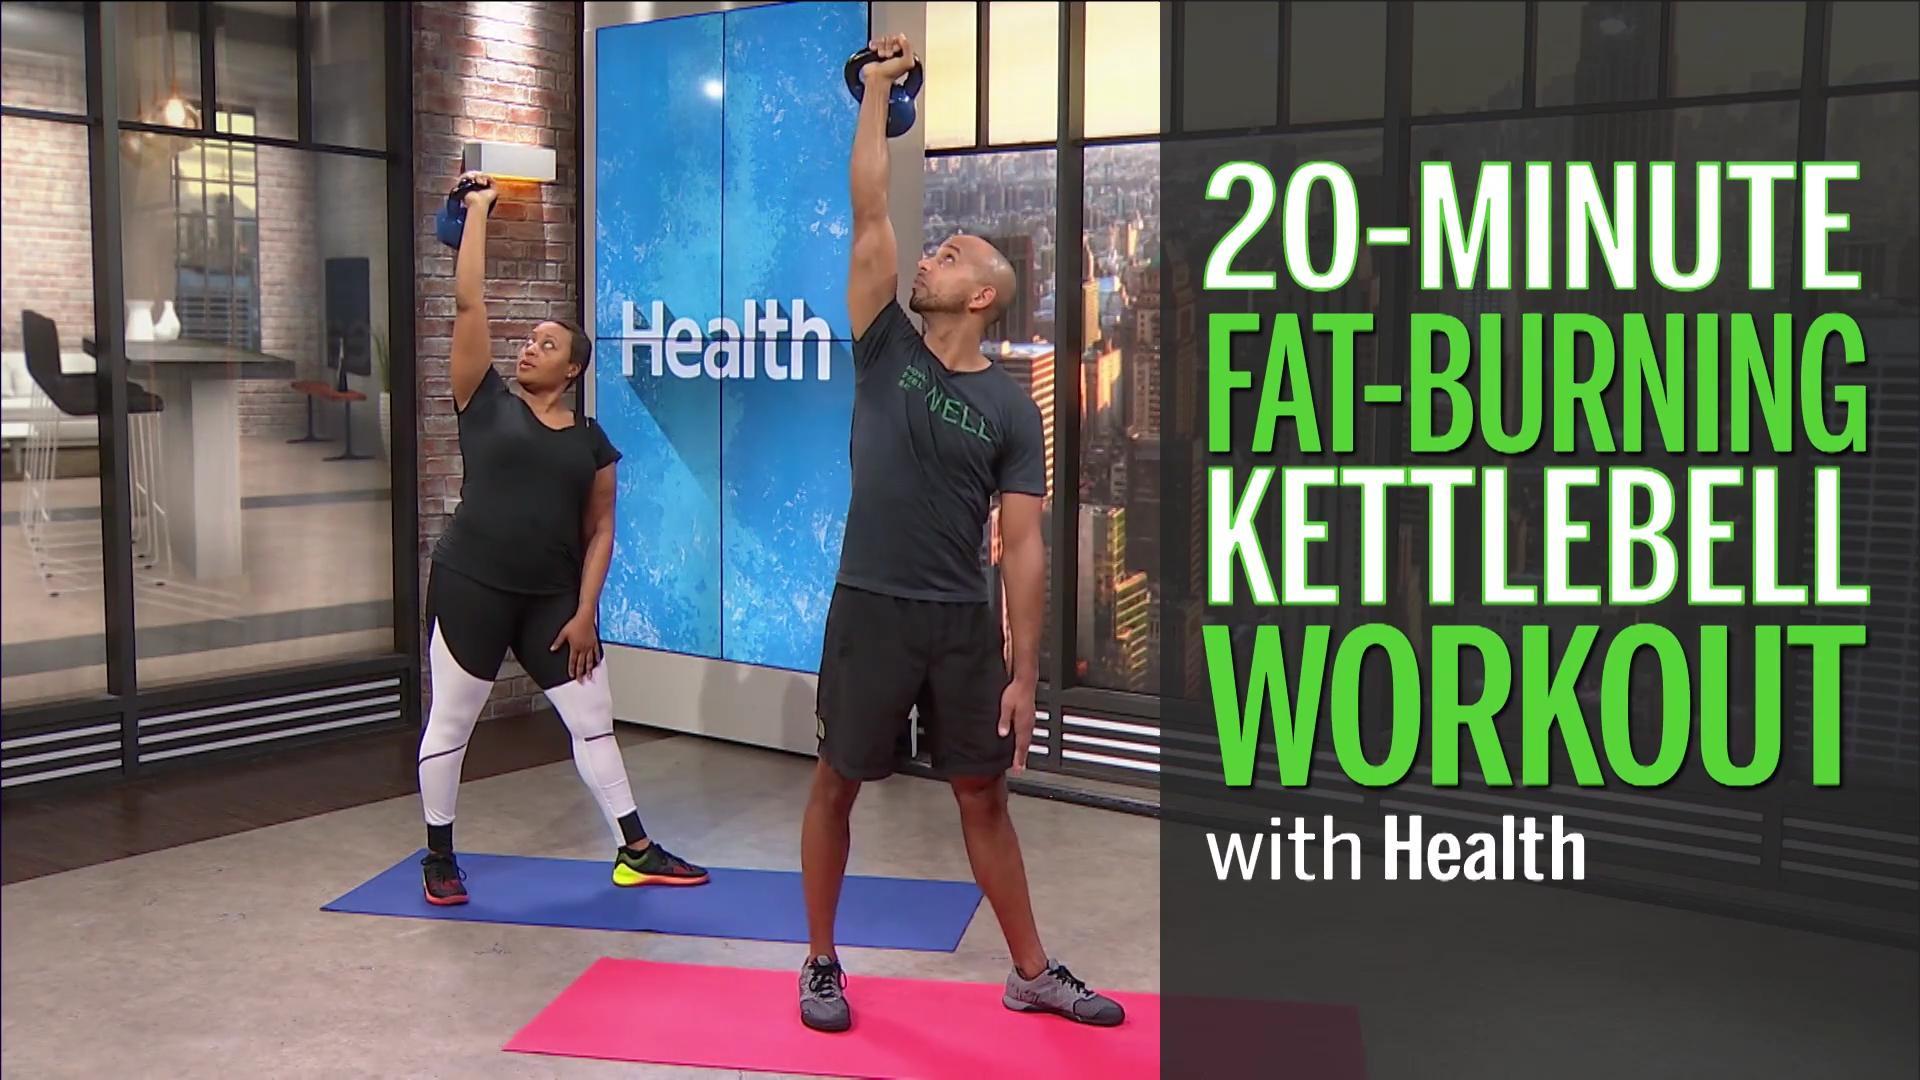 A 20-Minute Fat-Burning Kettlebell Workout